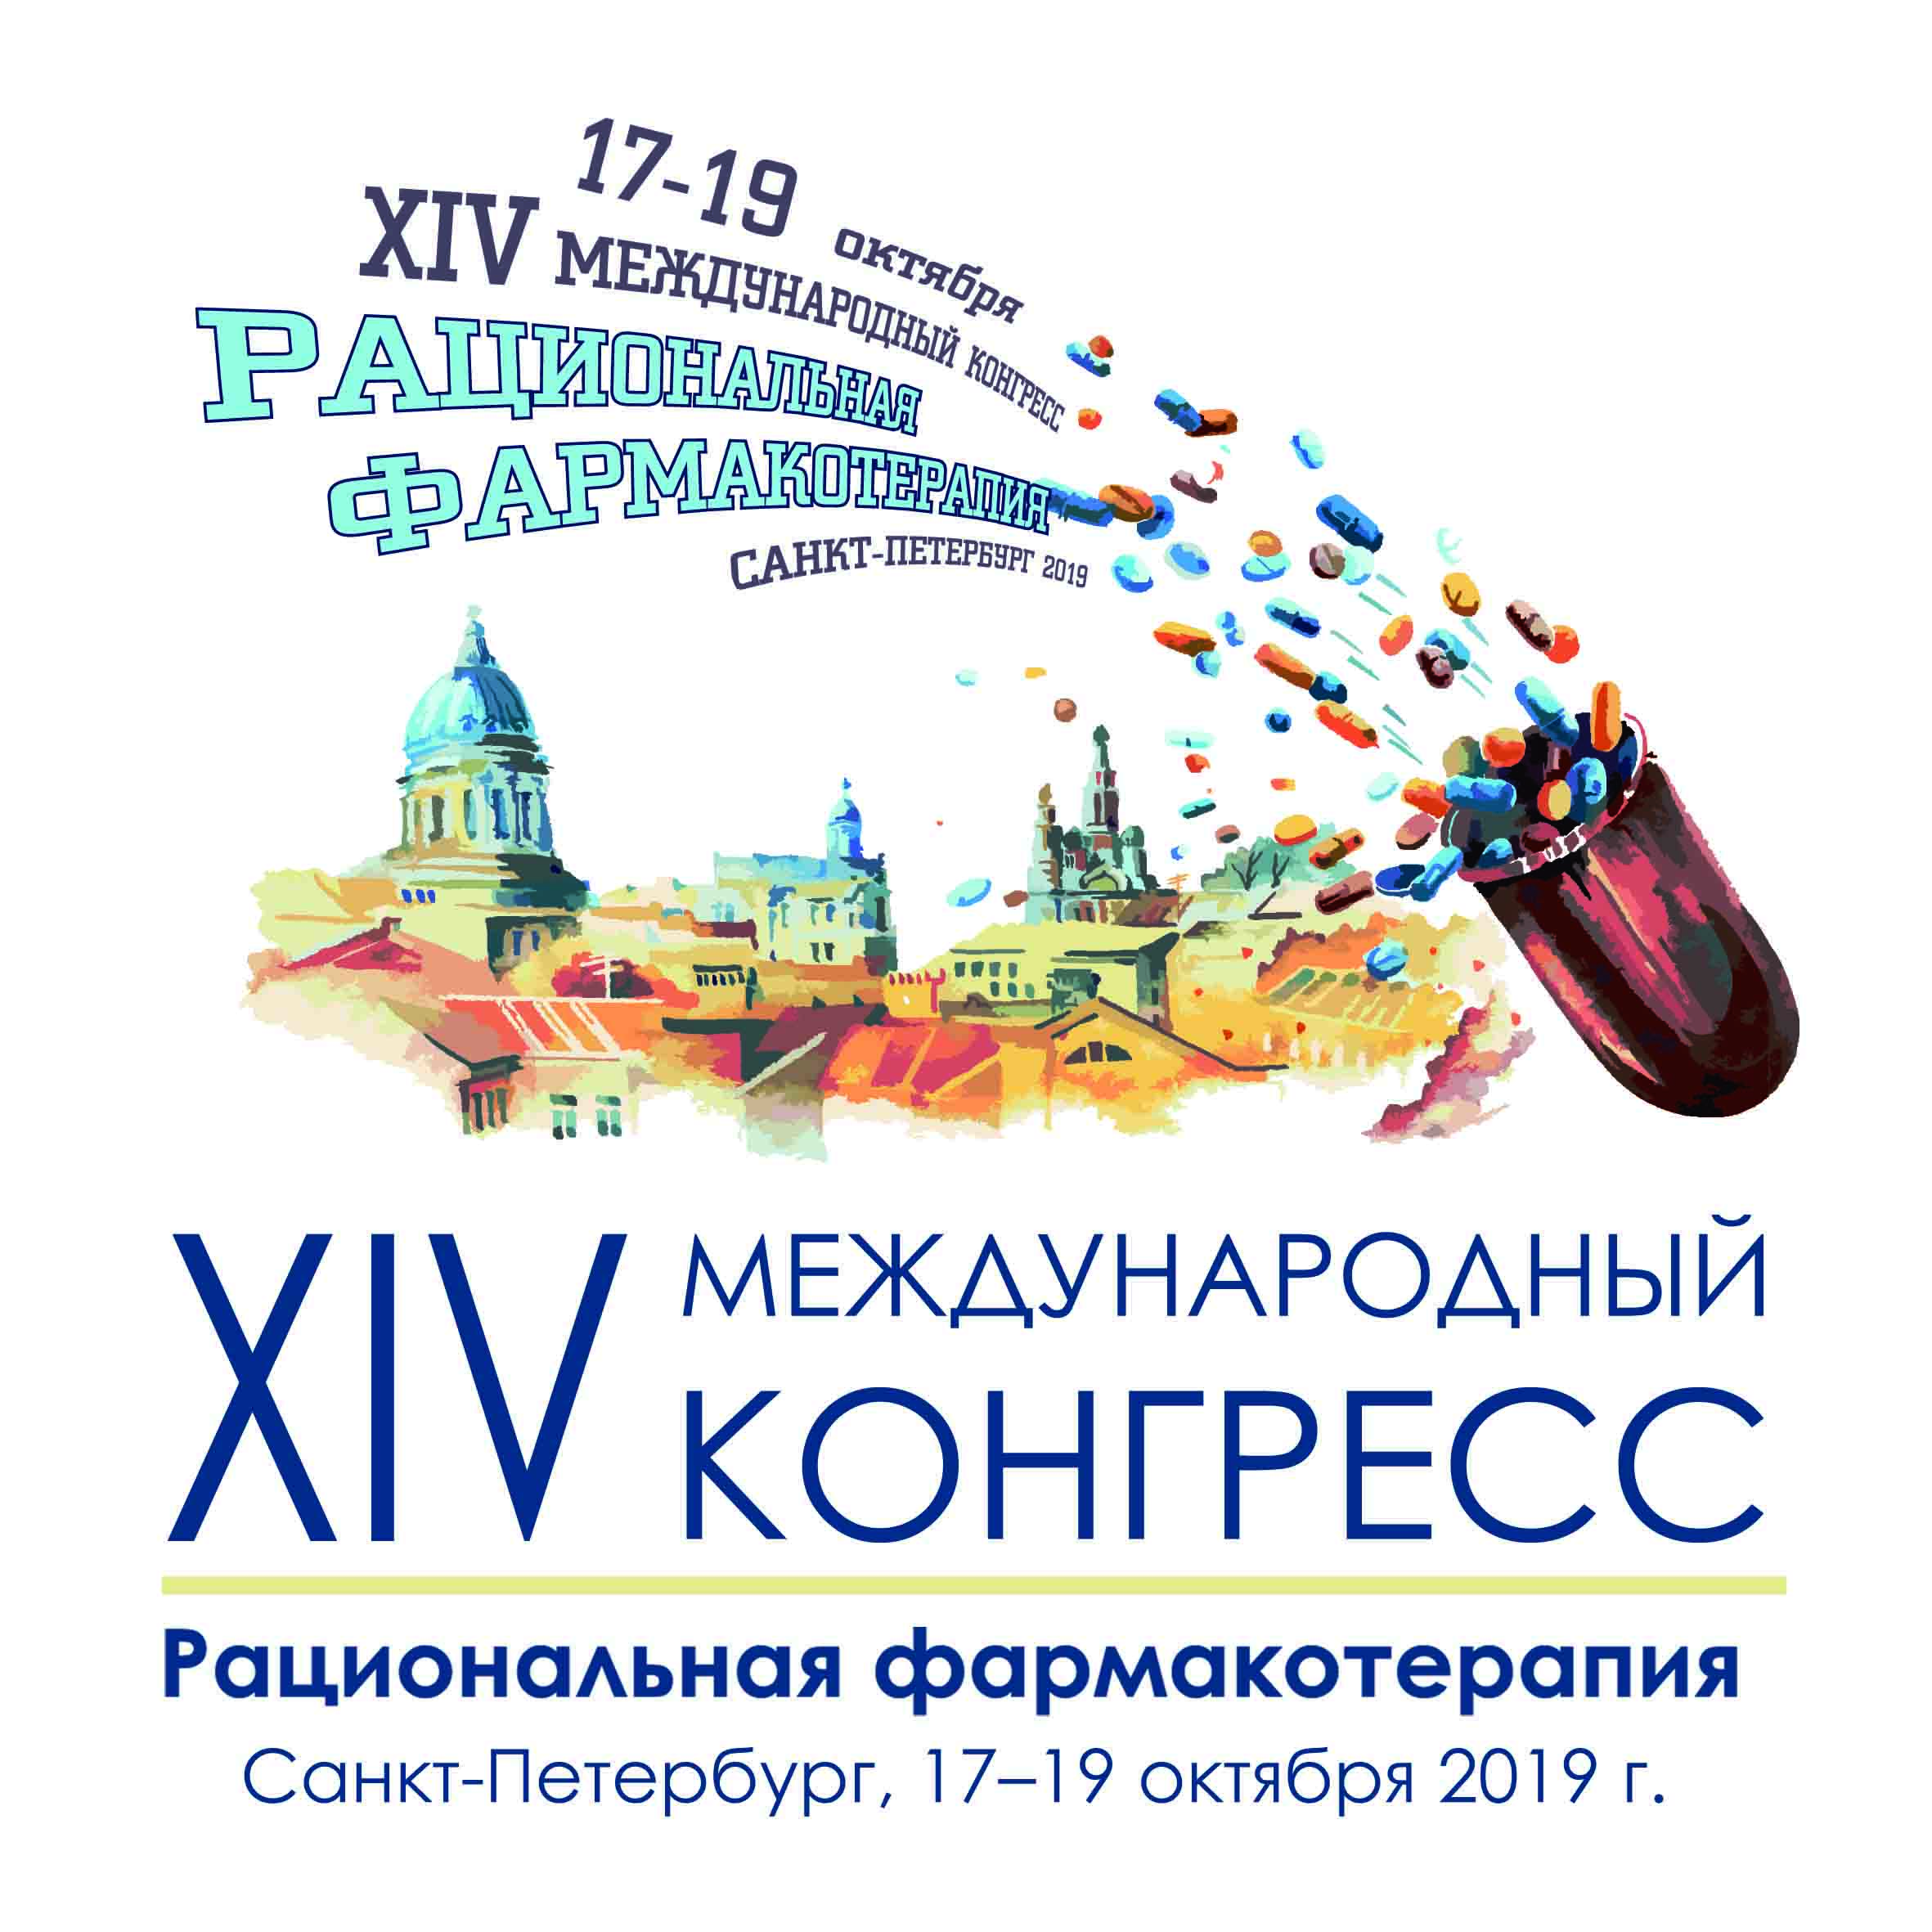 17-19 октября Рациональная фармакотерапия